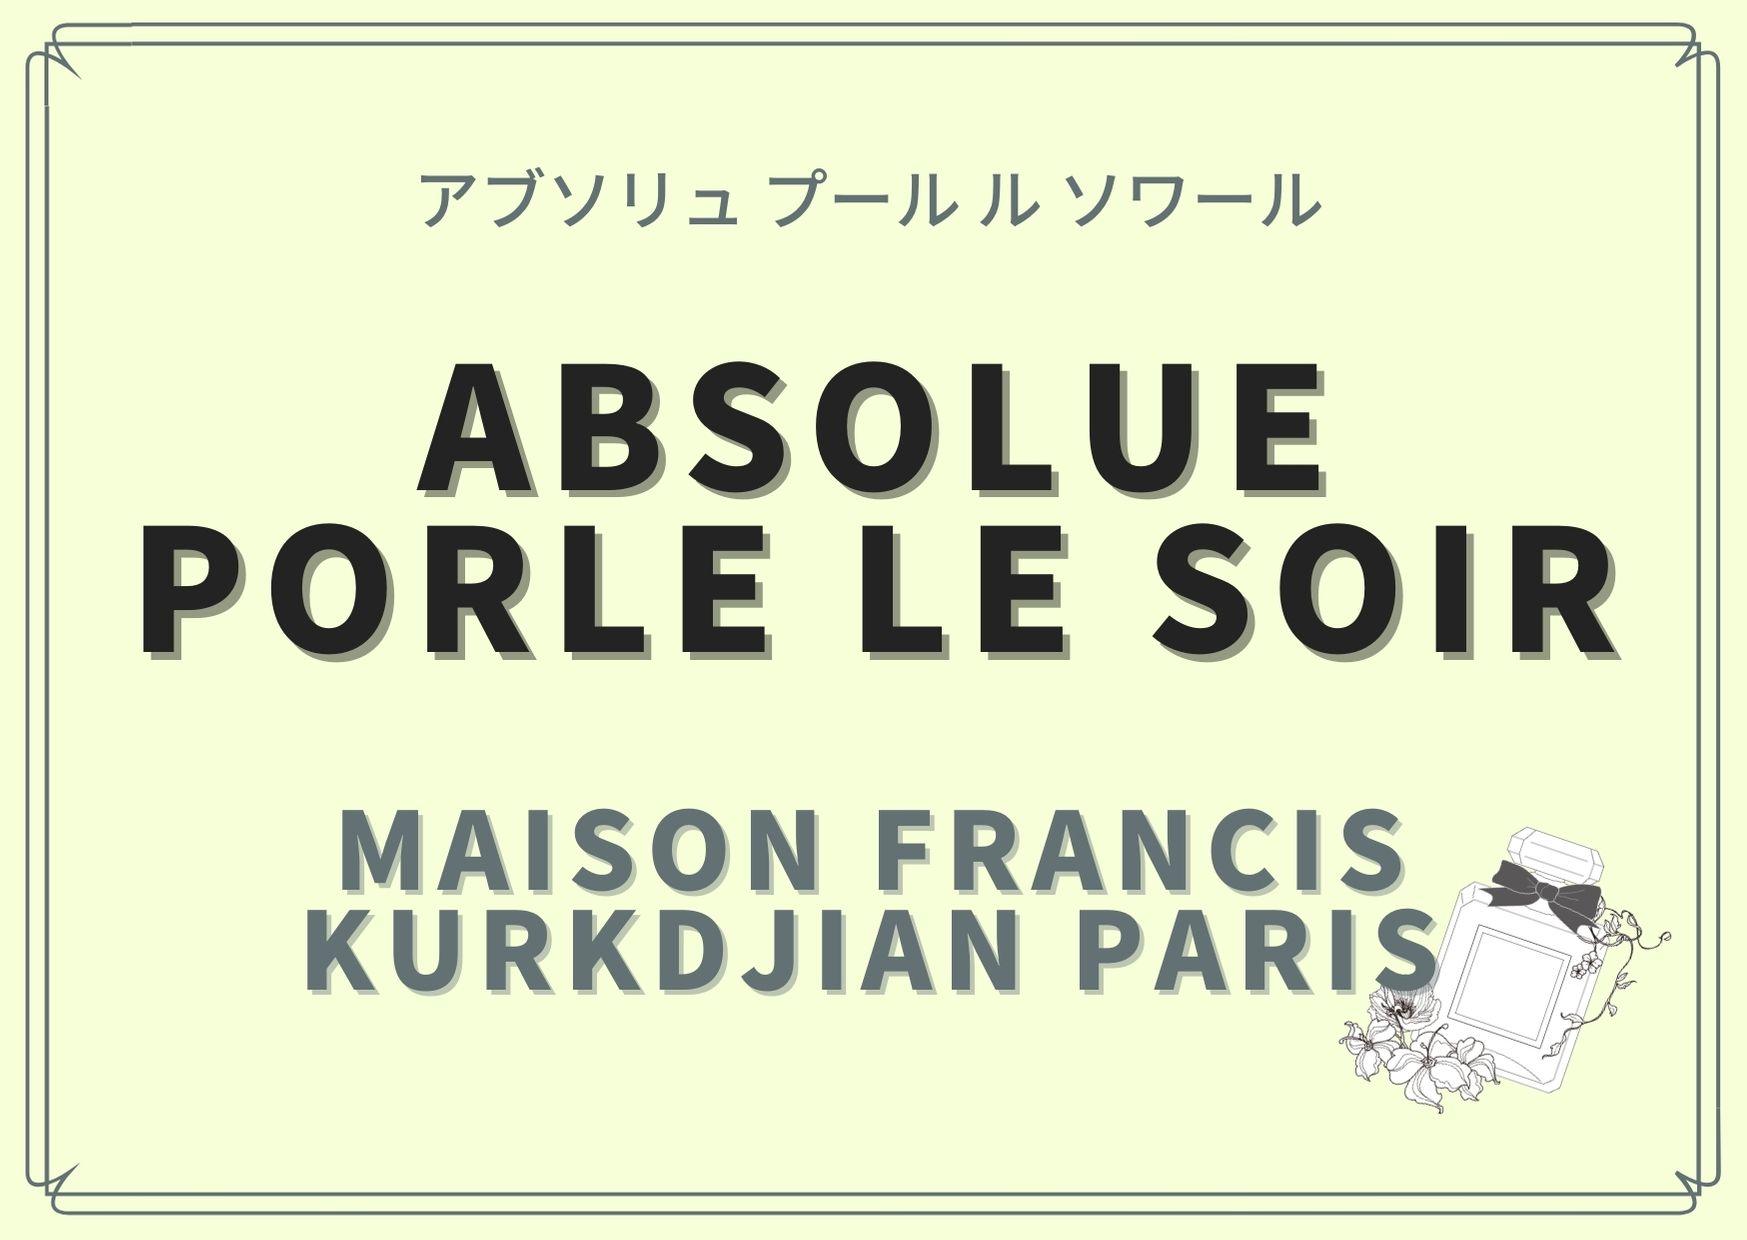 ABSOLUE PORLE LE SOIR(アブソリュ プール ル ソワール) / Maison Francis Kurkdjian Paris(メゾン フランシス クルジャン)